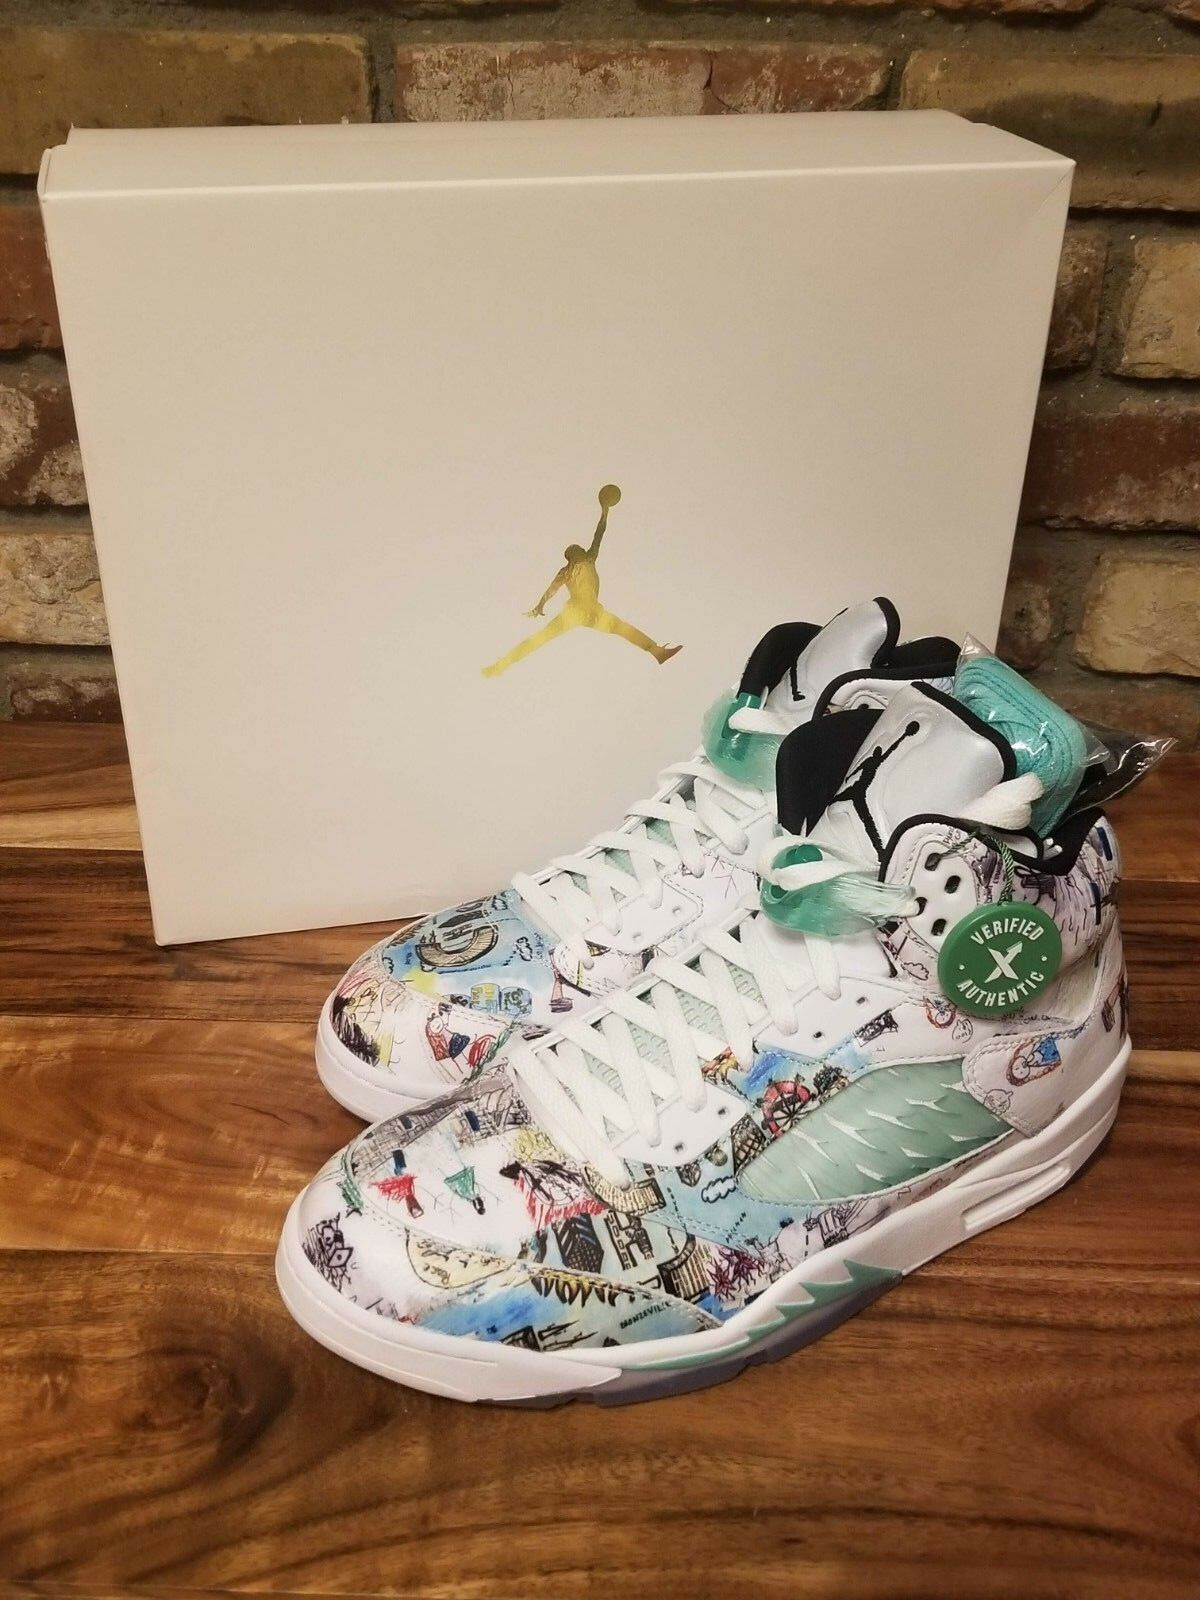 Nike Air Jordan V 5 Retro Wings DS Men's size 11-12